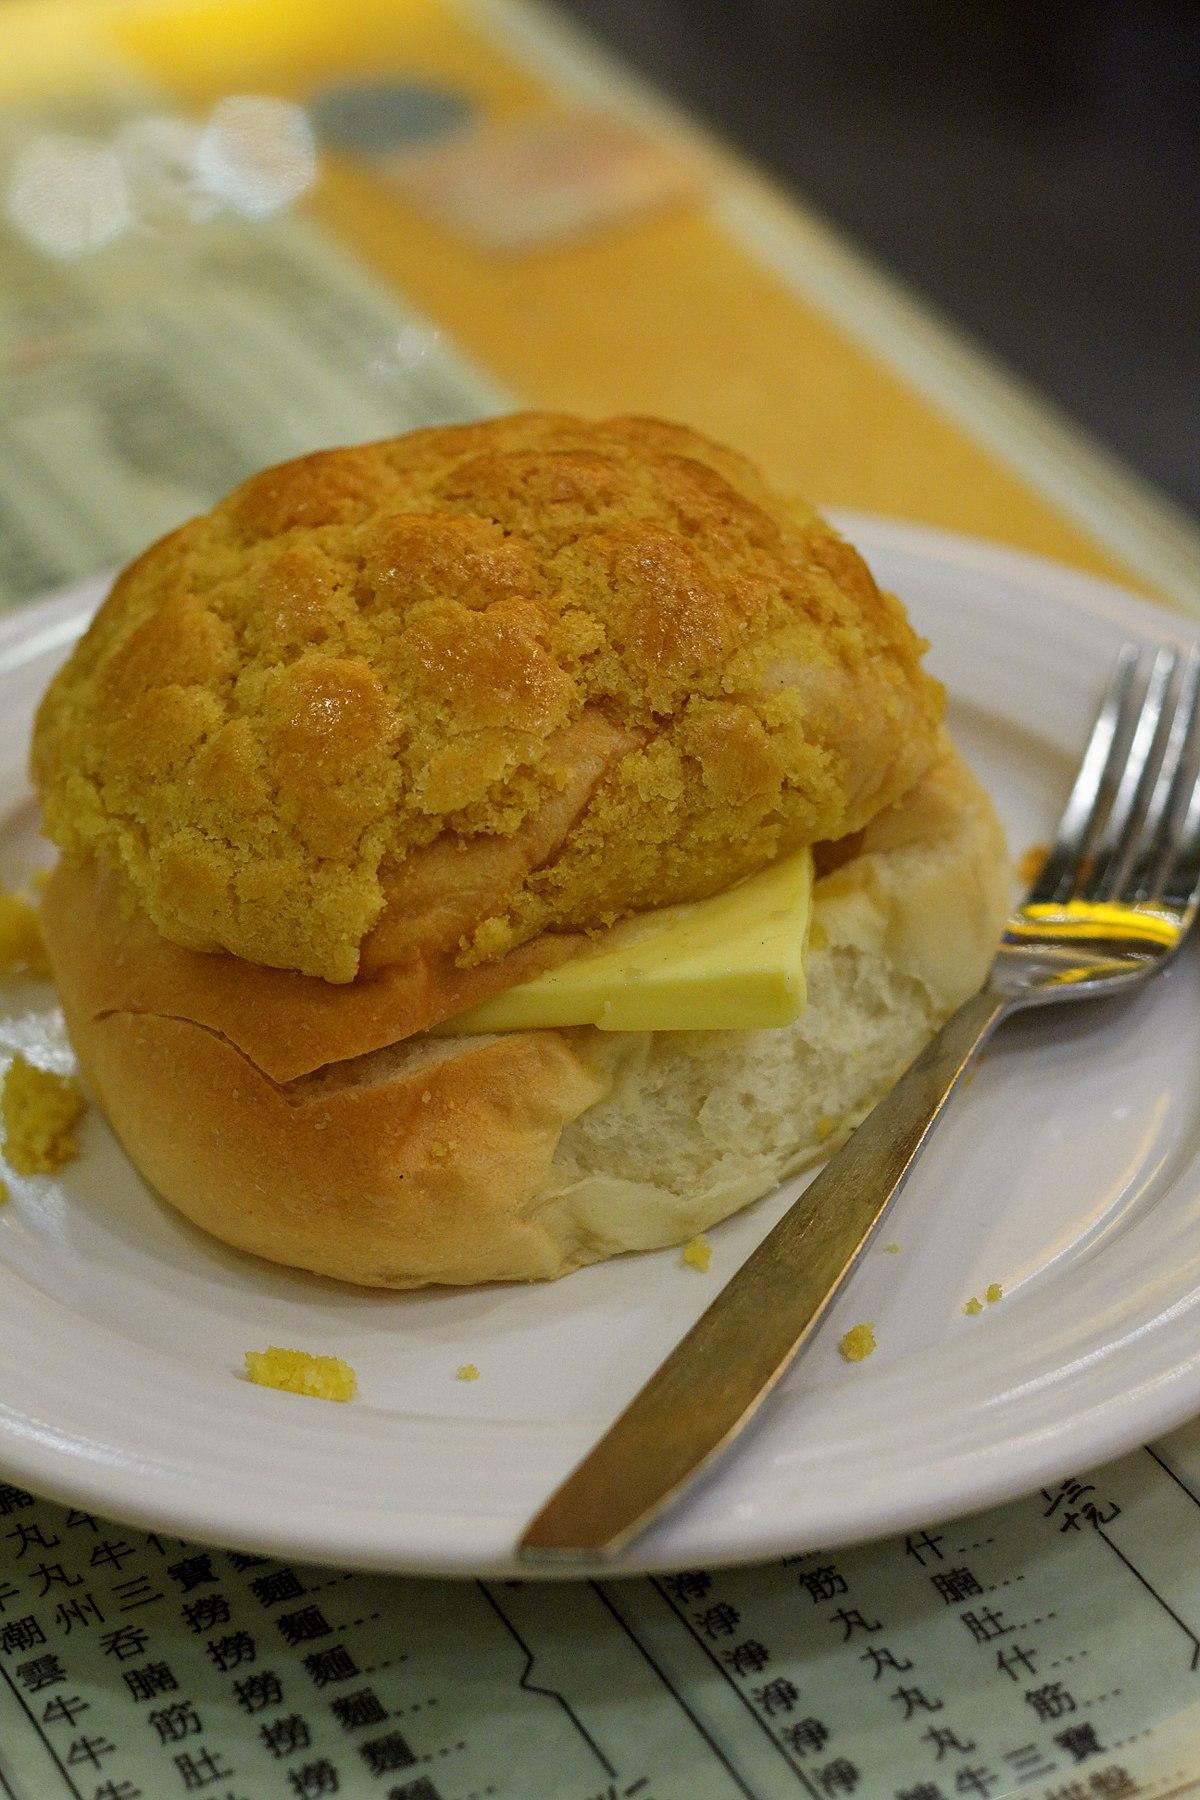 Hong Kong Flour Cake Recipe